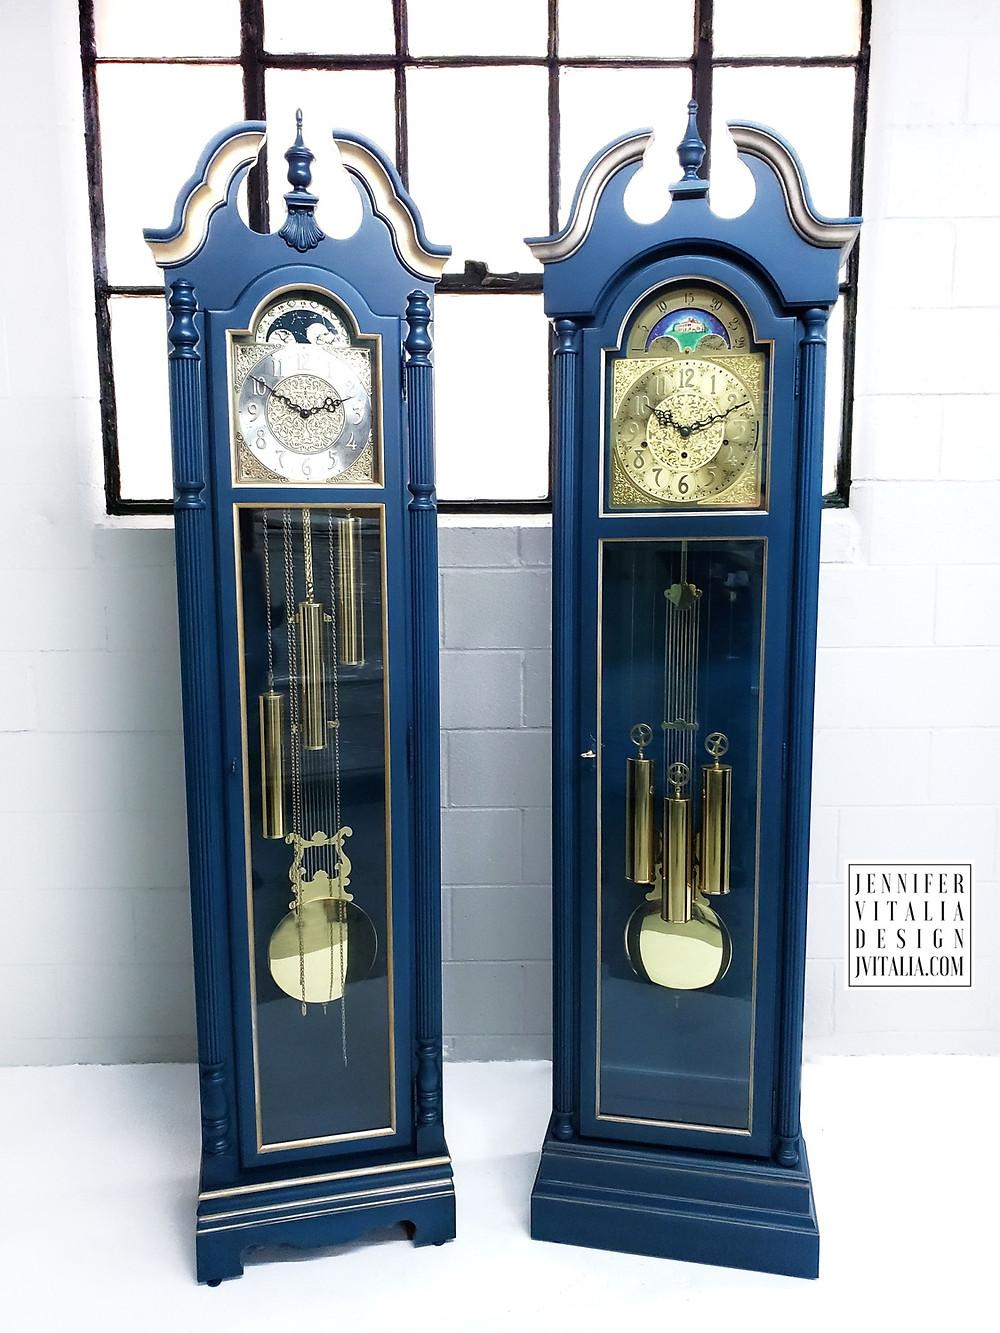 Hand Painted Grandfather Clocks - Jennifer Vitalia Design